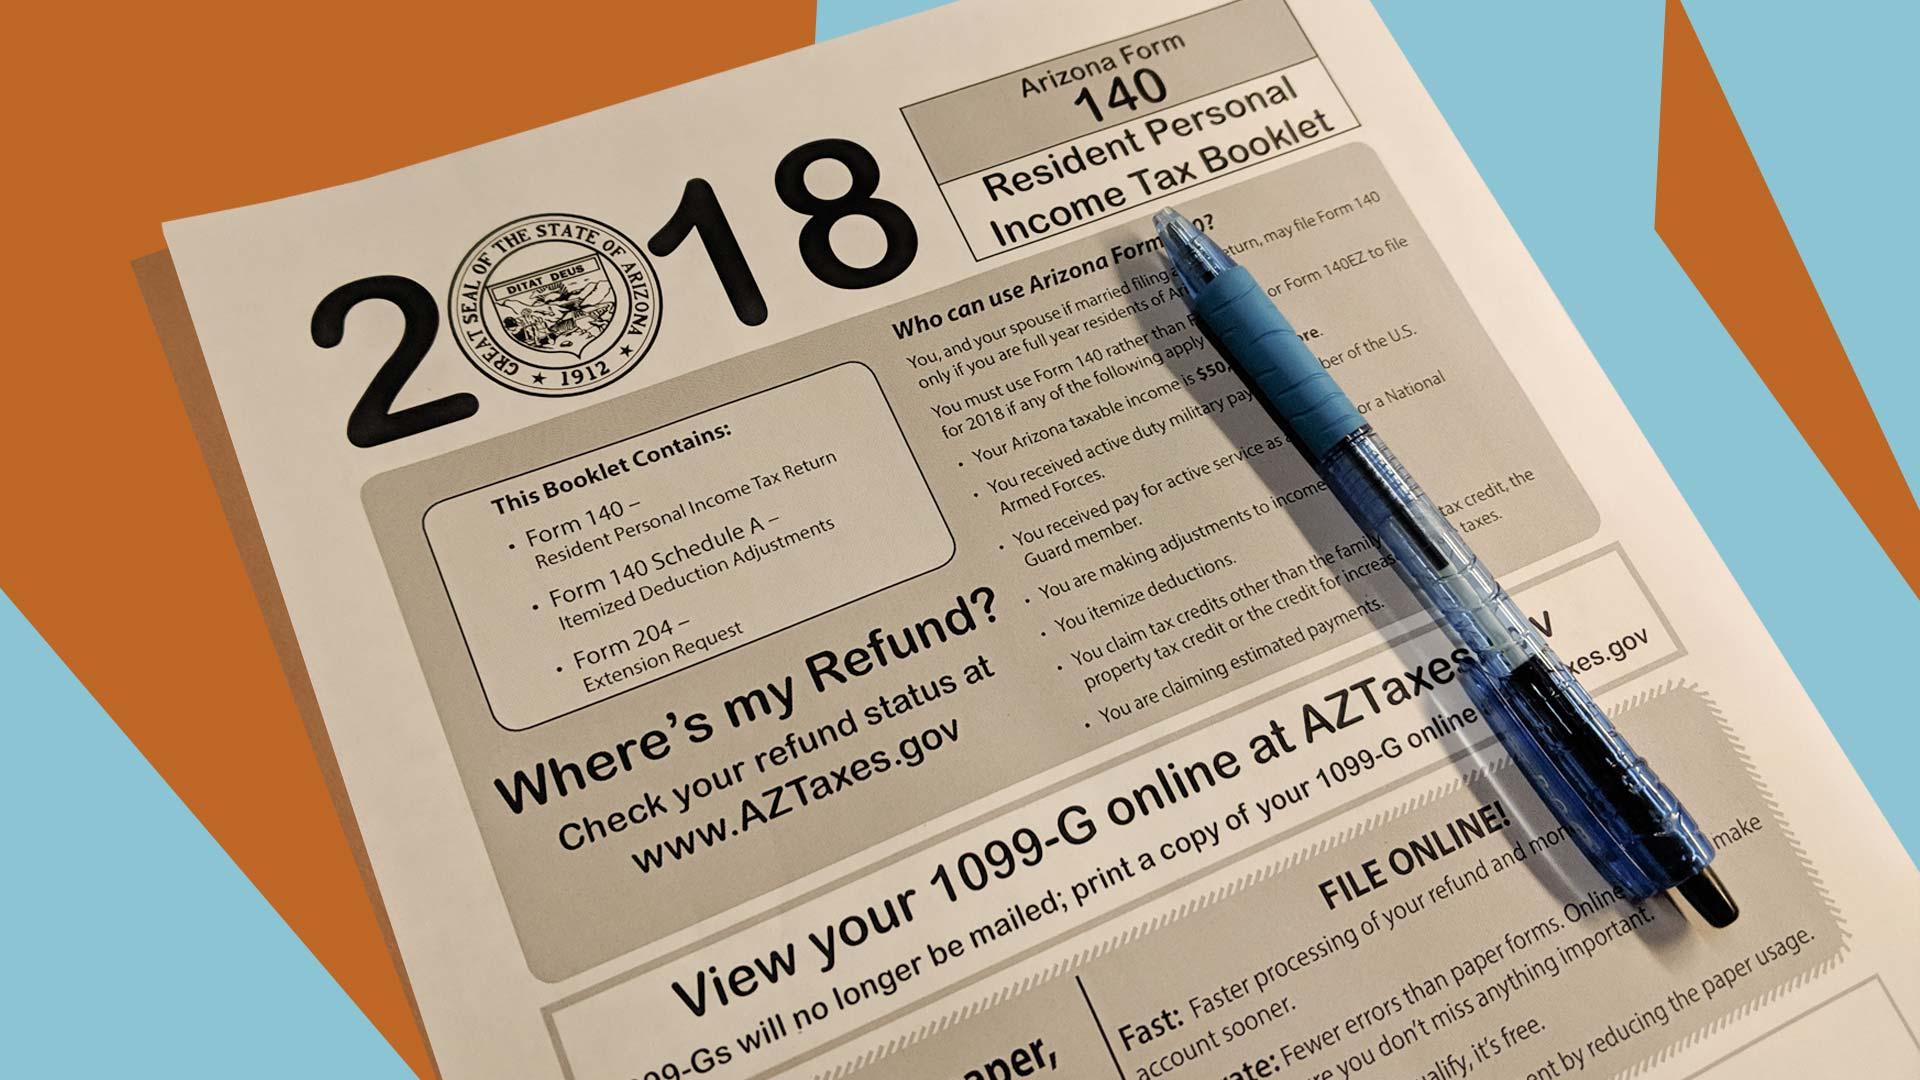 State Of Arizona Form 1099 G